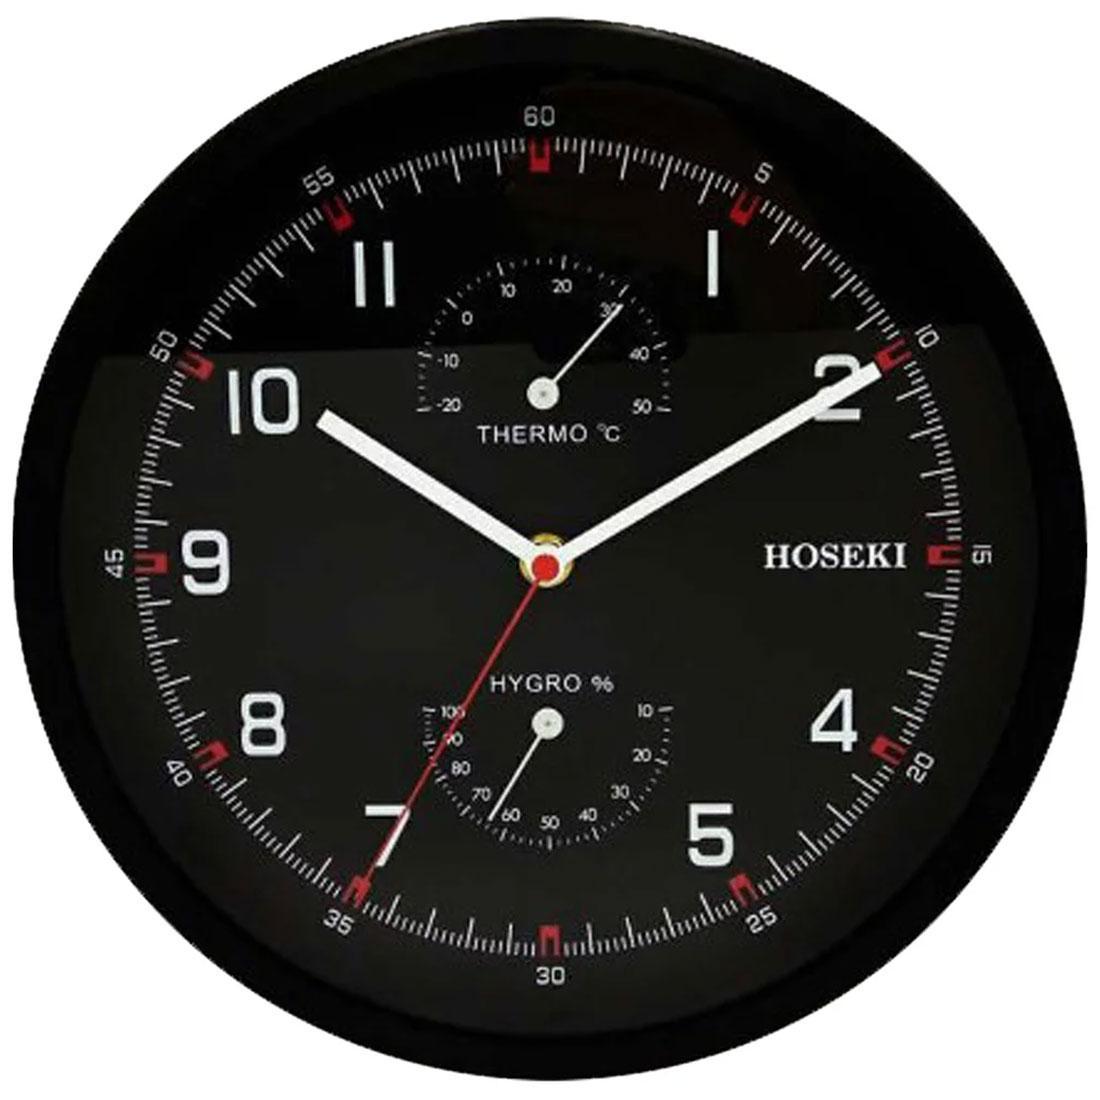 Hoseki Thermometer Hygrometer Black Analog Decor Wall Clock H-9402 H-9402B